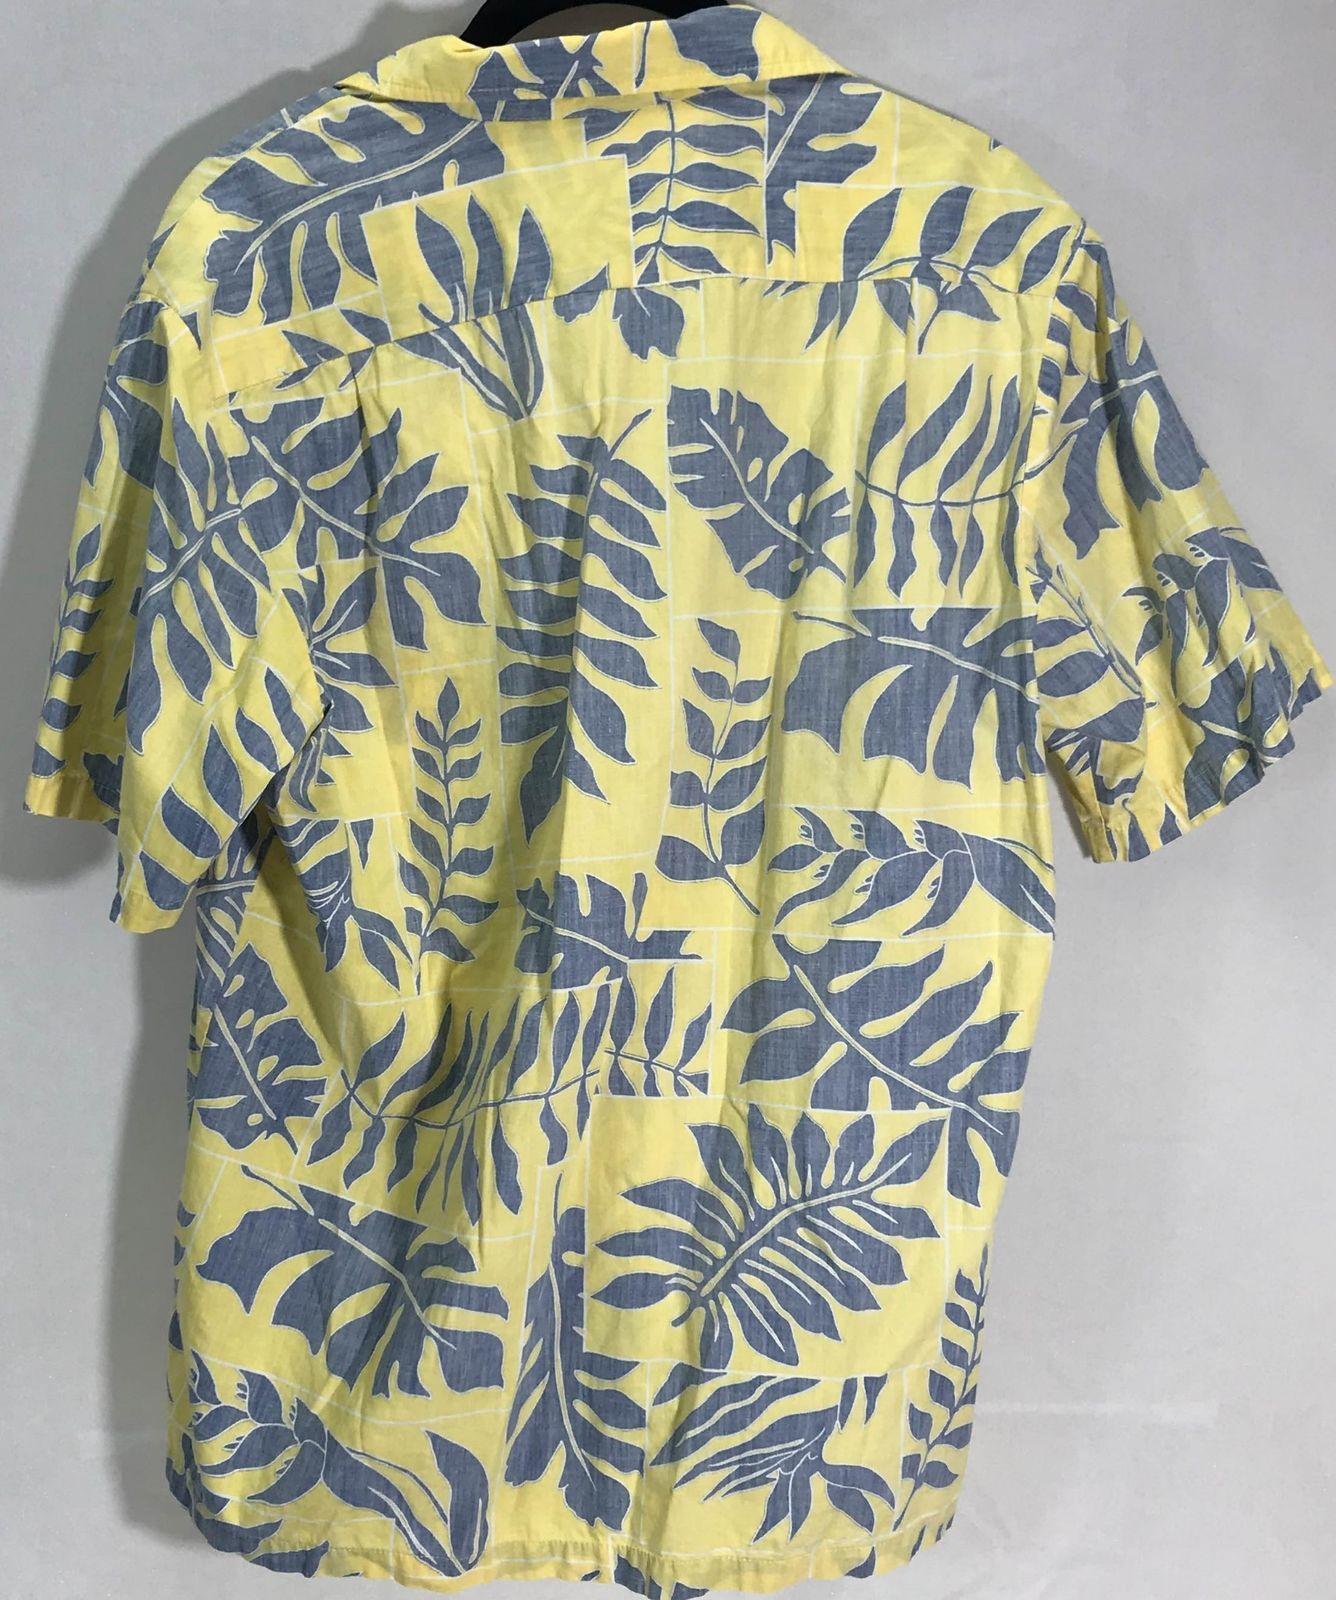 Cooke Street M Hawaiian Yellow Blue Leaves Reverse Print Pullover Aloha Shirt